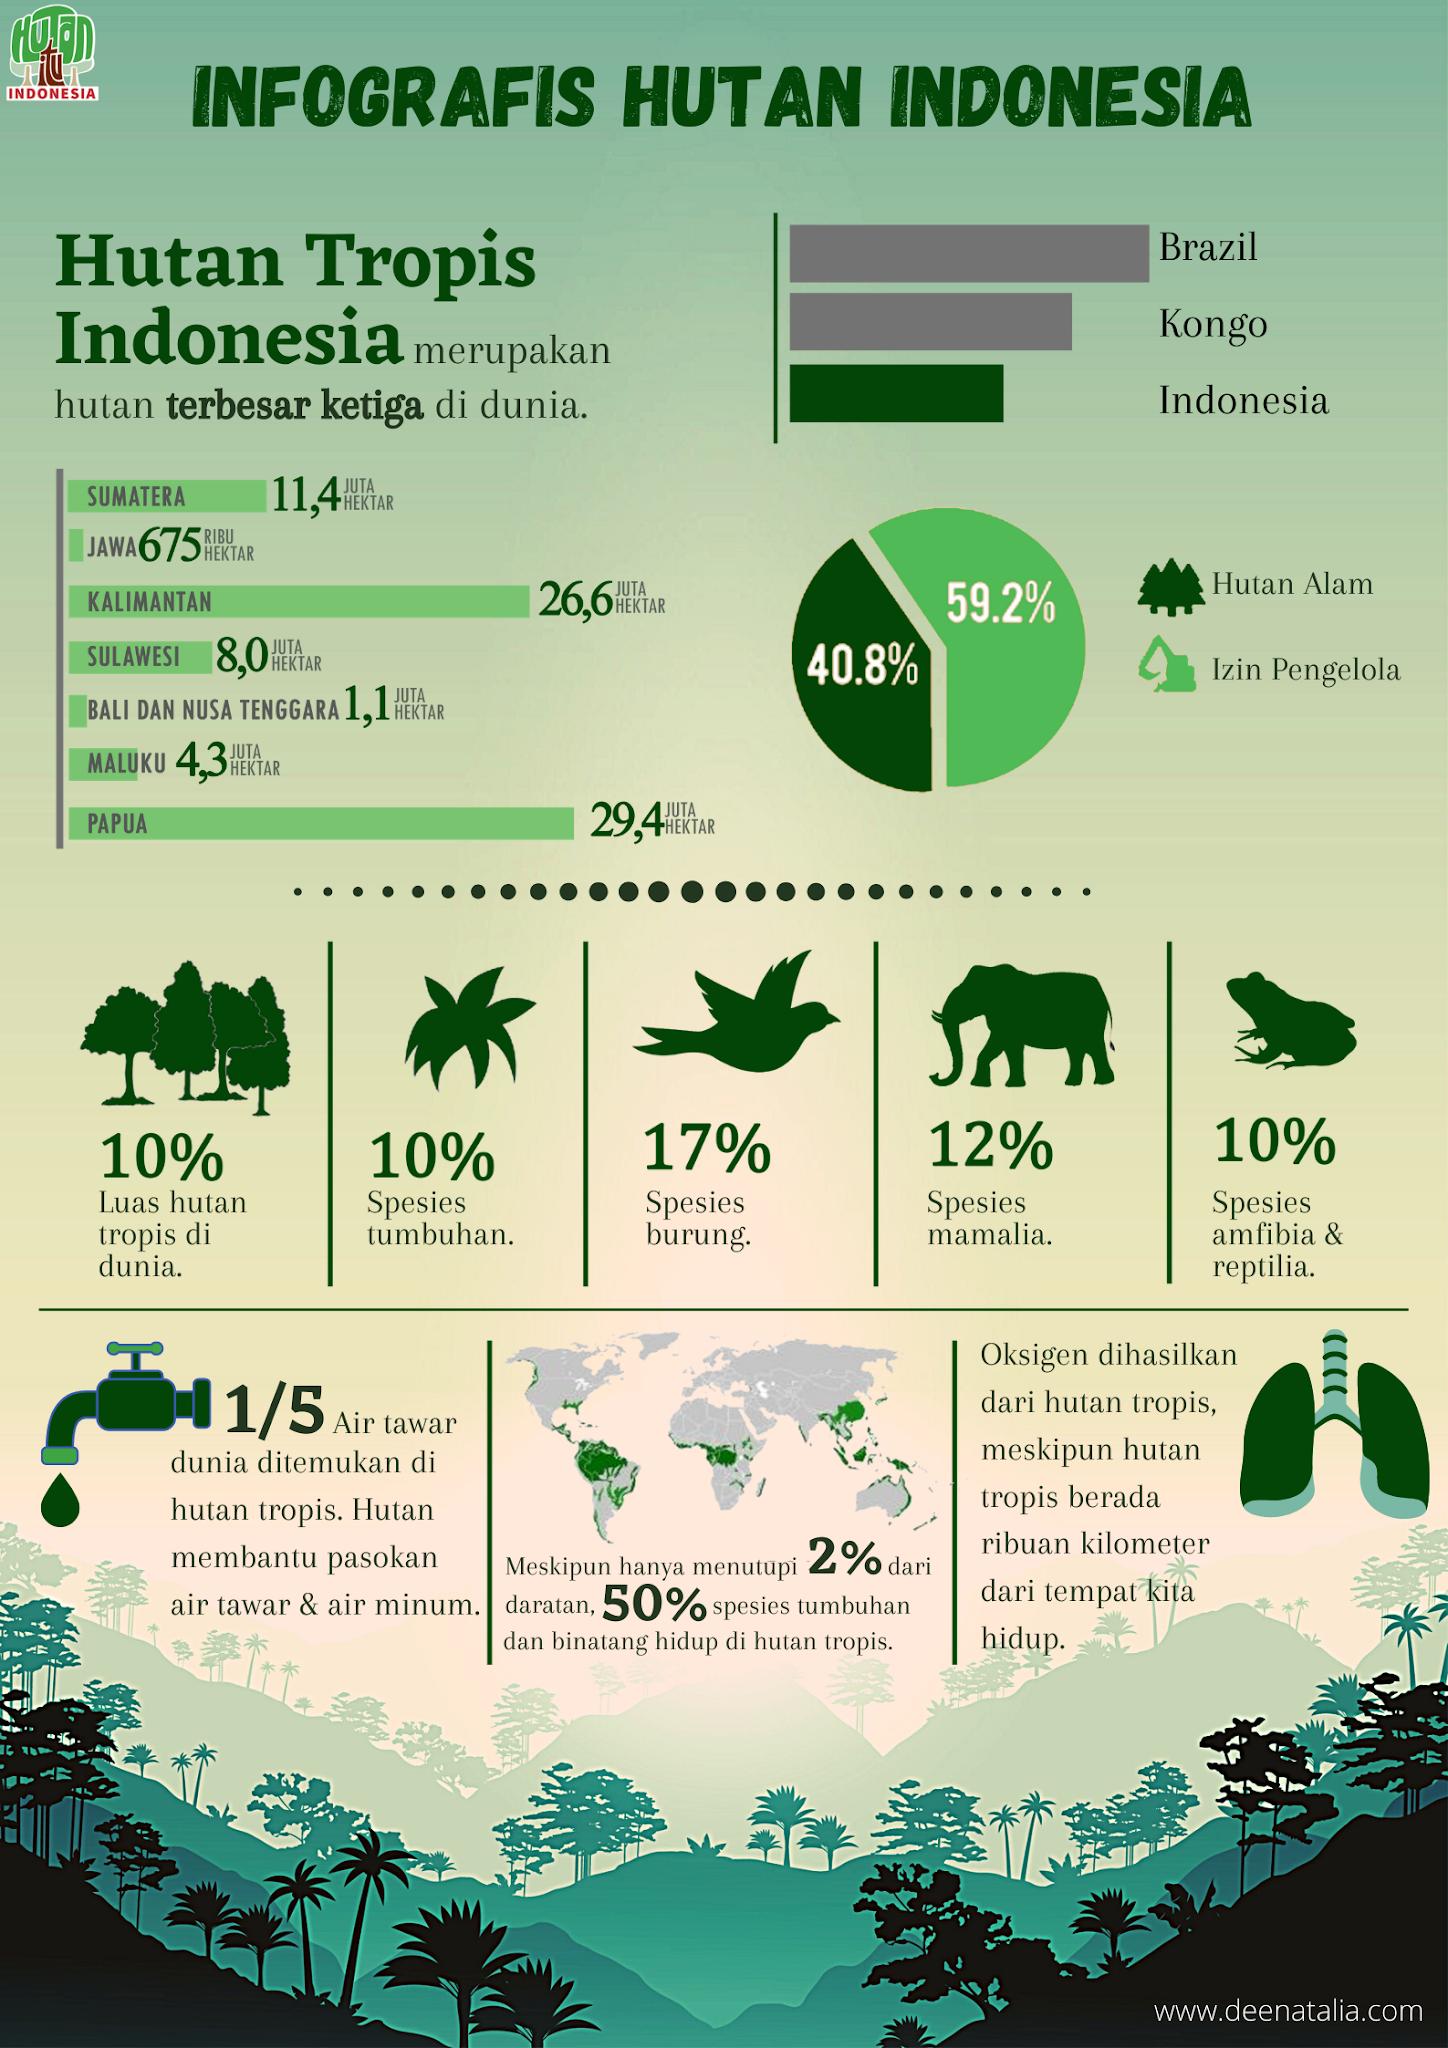 Infografis Hutan Indonesia